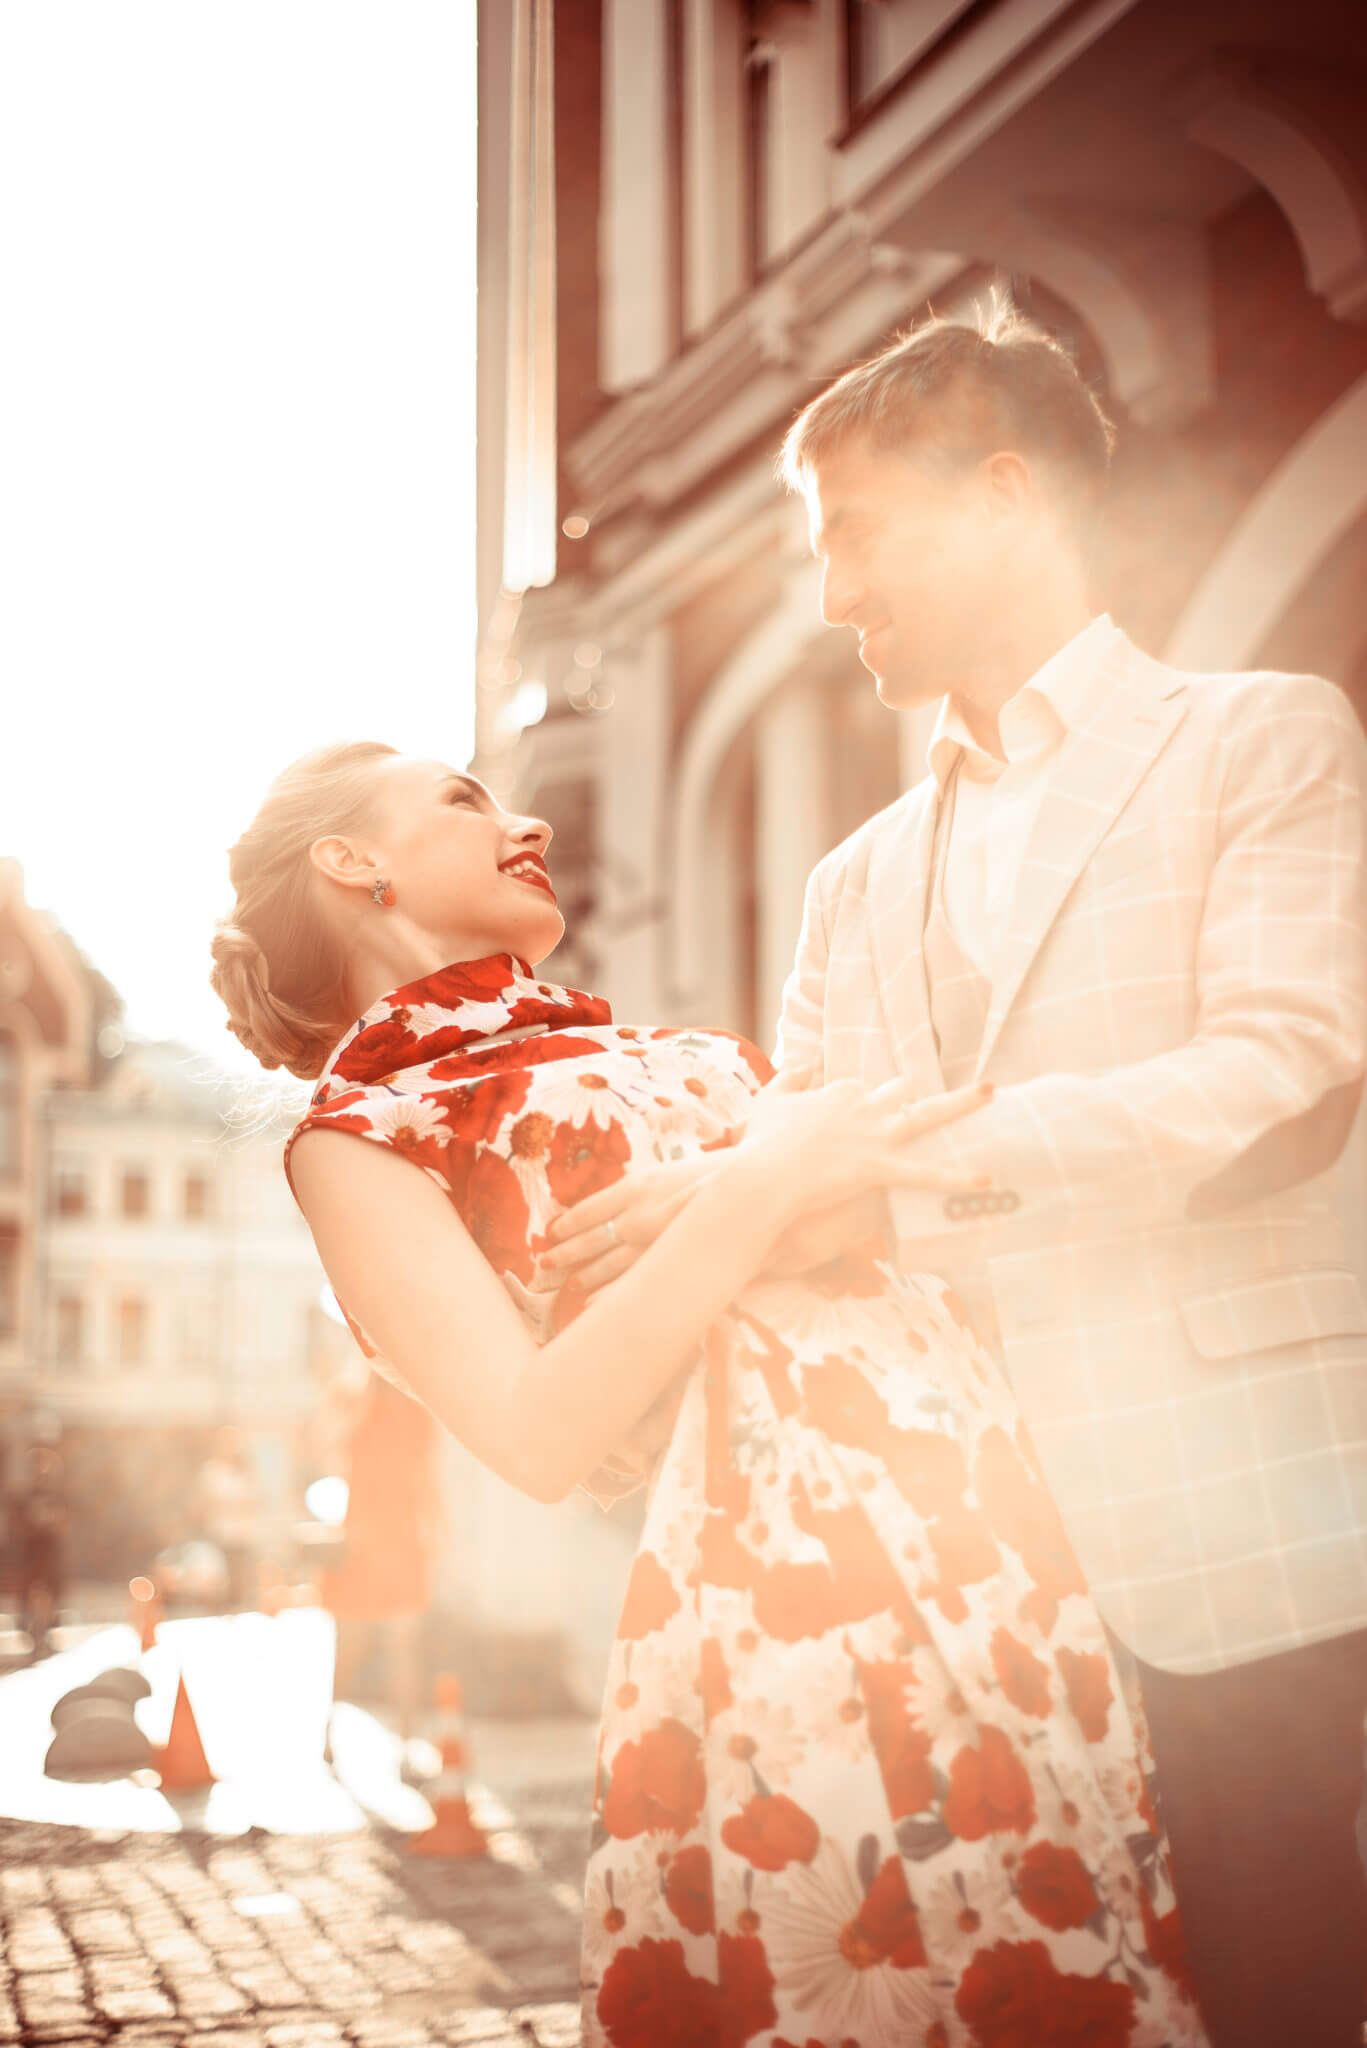 Love story фотосессия на природе, прогулка по городу, Воздвиженка, закат, ph Постникова Алиса